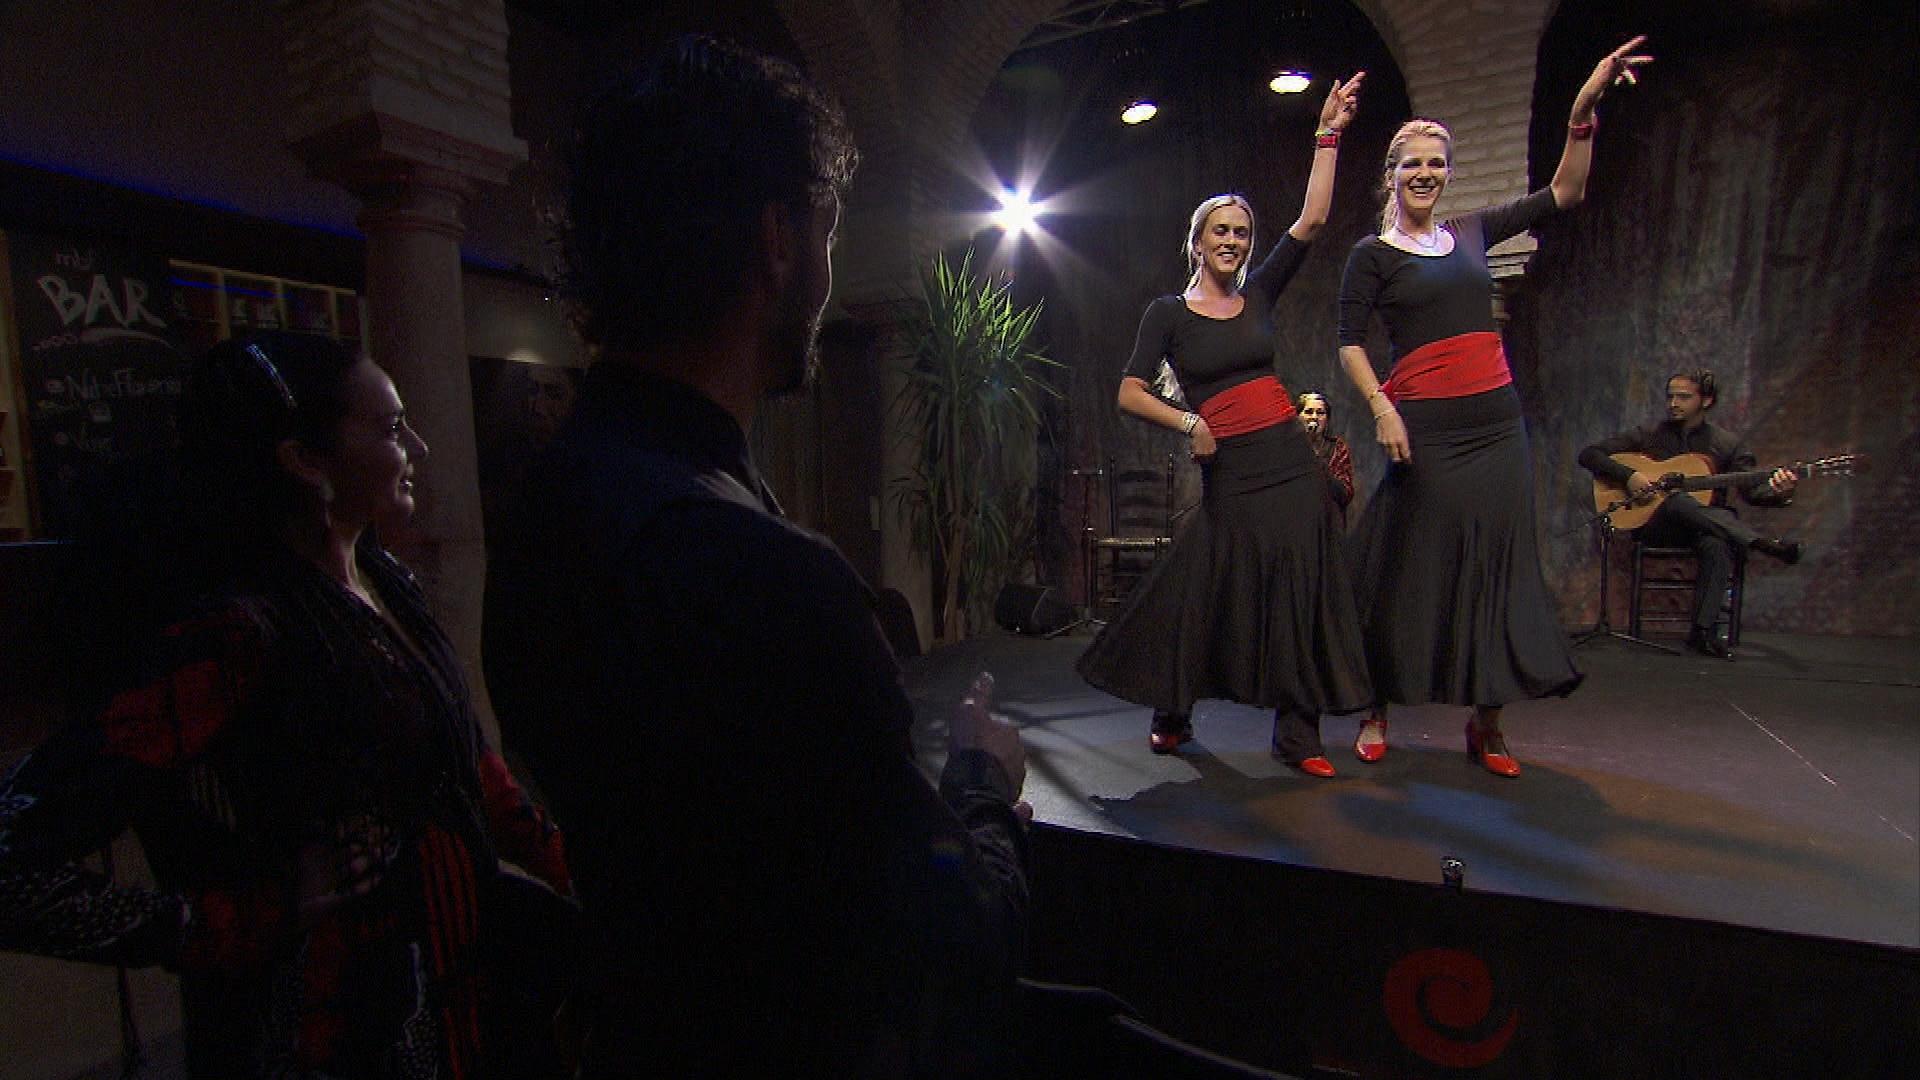 Dance routine in Season 24 Episode 10